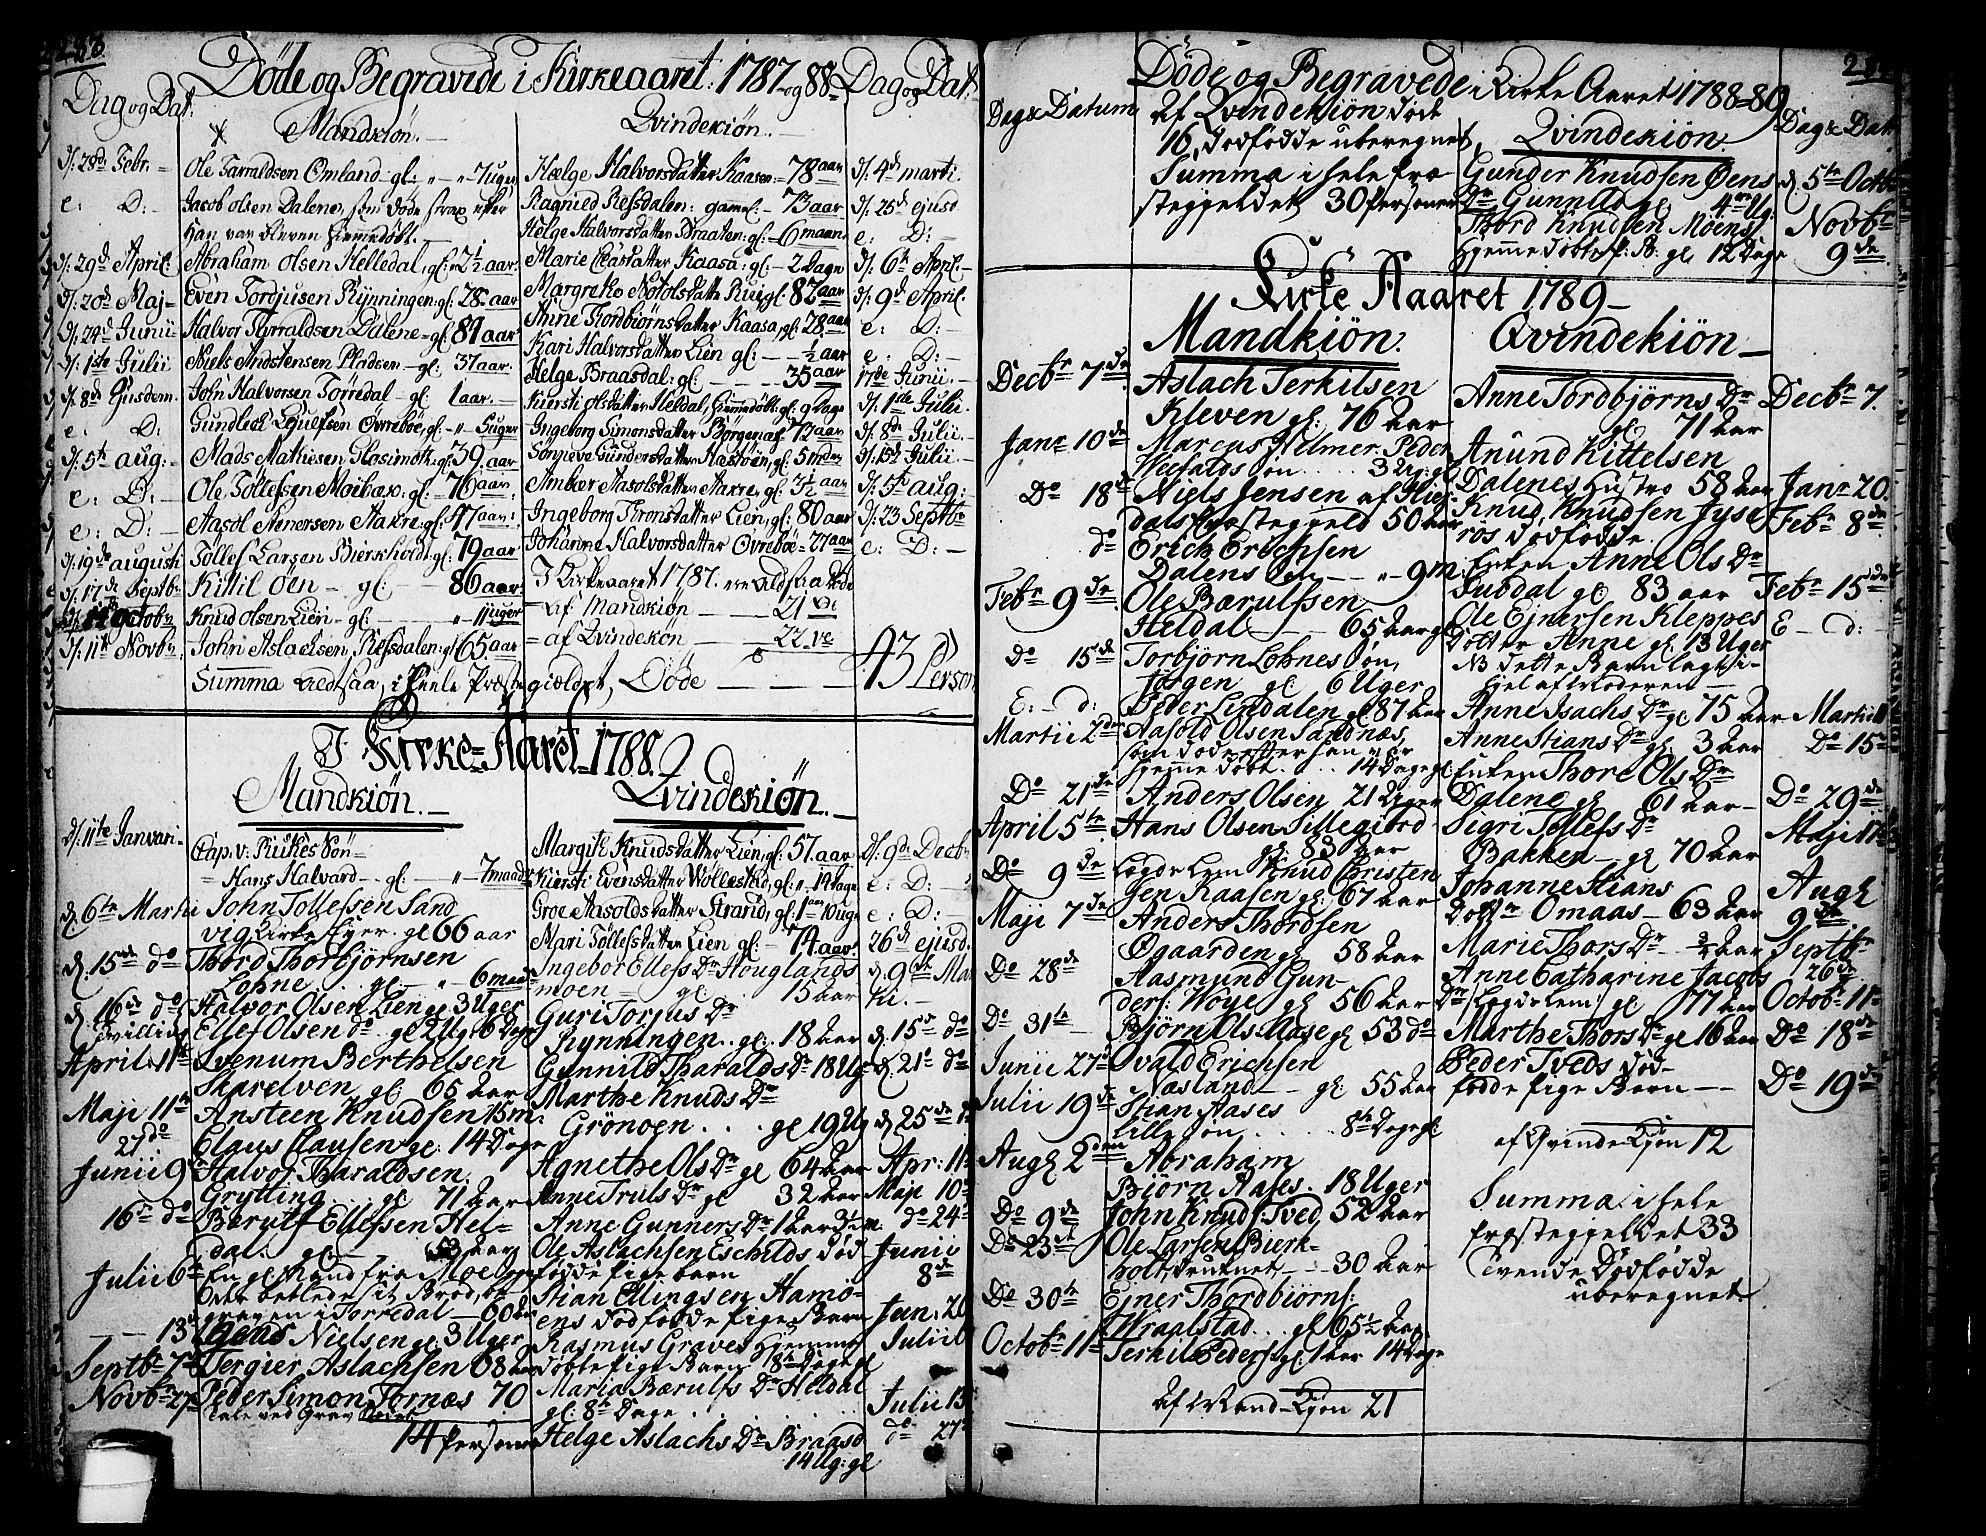 SAKO, Drangedal kirkebøker, F/Fa/L0003: Ministerialbok nr. 3, 1768-1814, s. 283-284